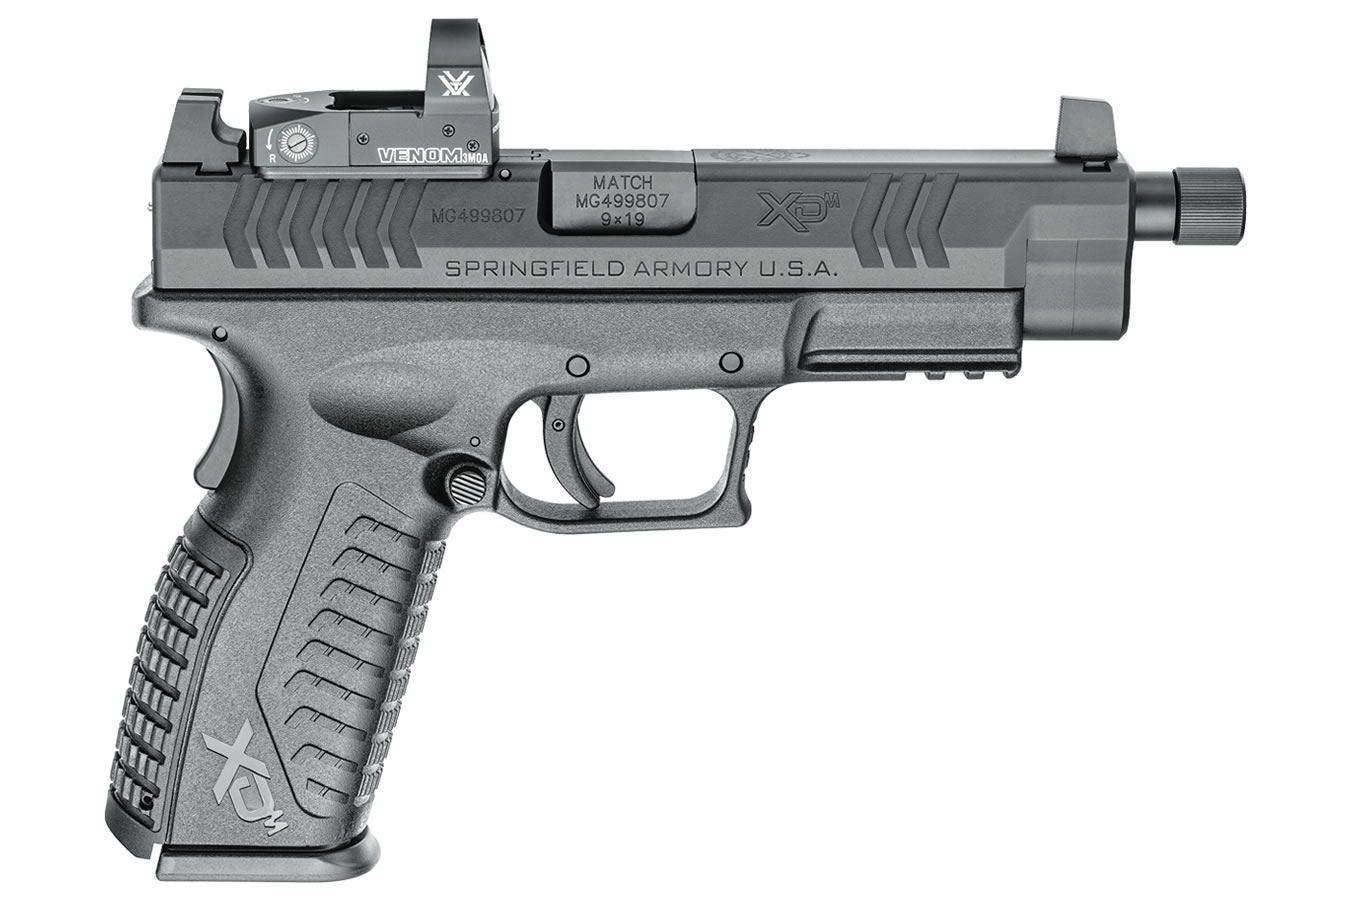 xdm guns threaded barrel sportsman osp springfield vortex 9mm superstore venom pistol dot